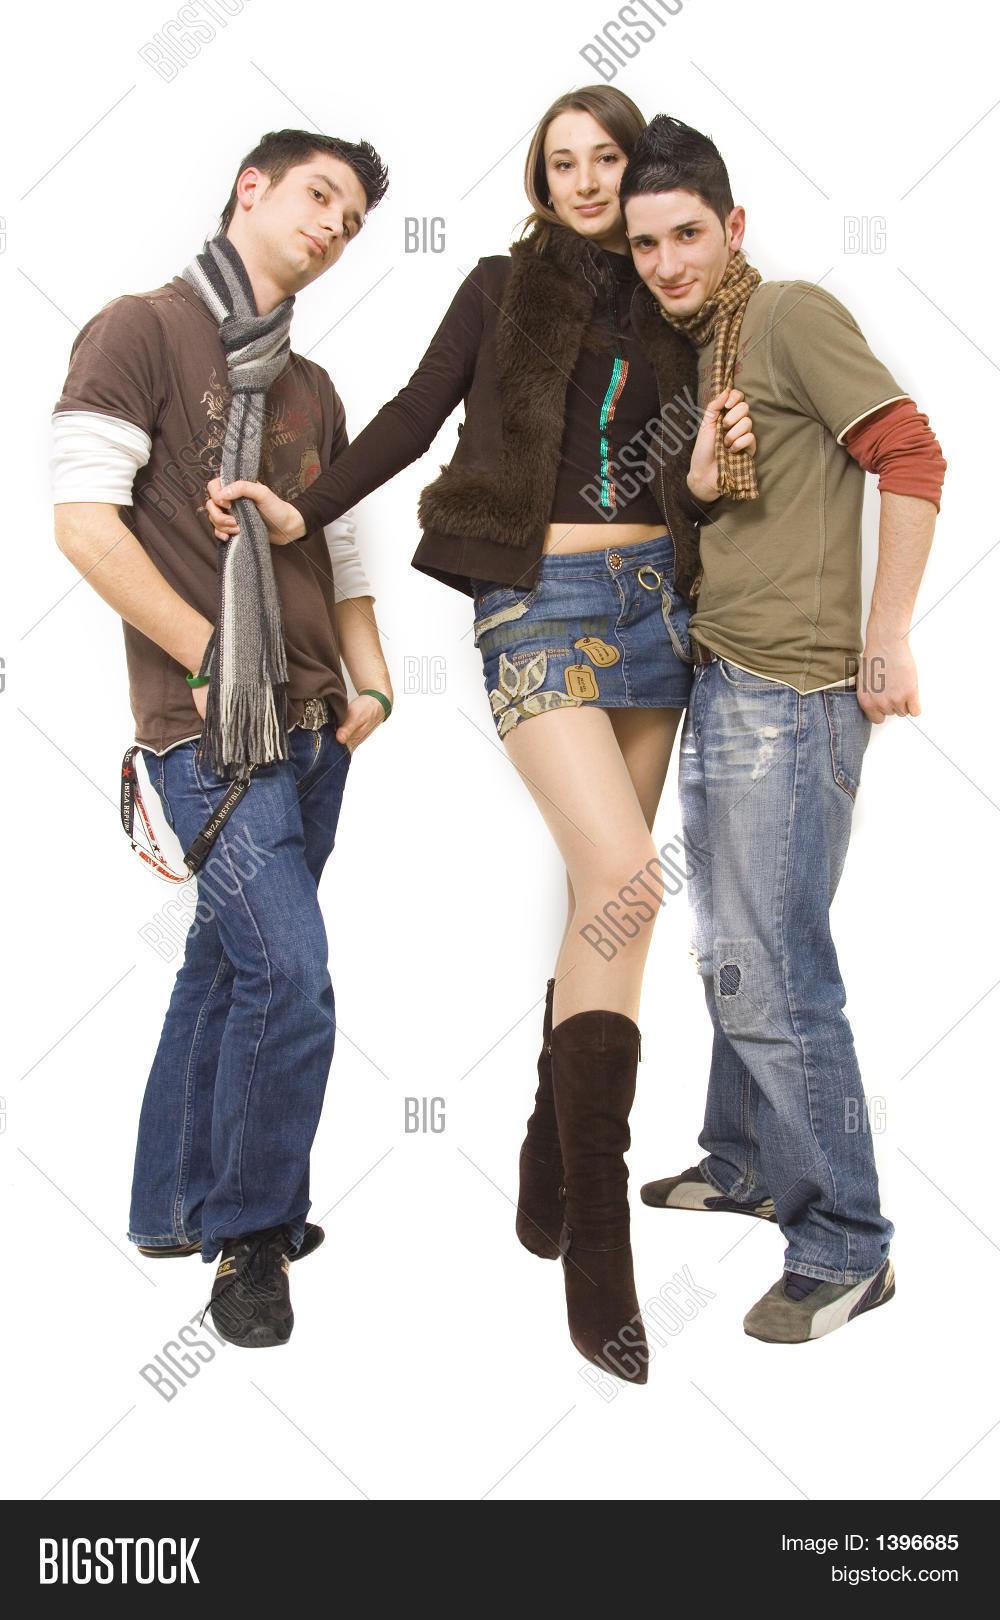 Threesome Date Image Photo Free Trial Bigstock